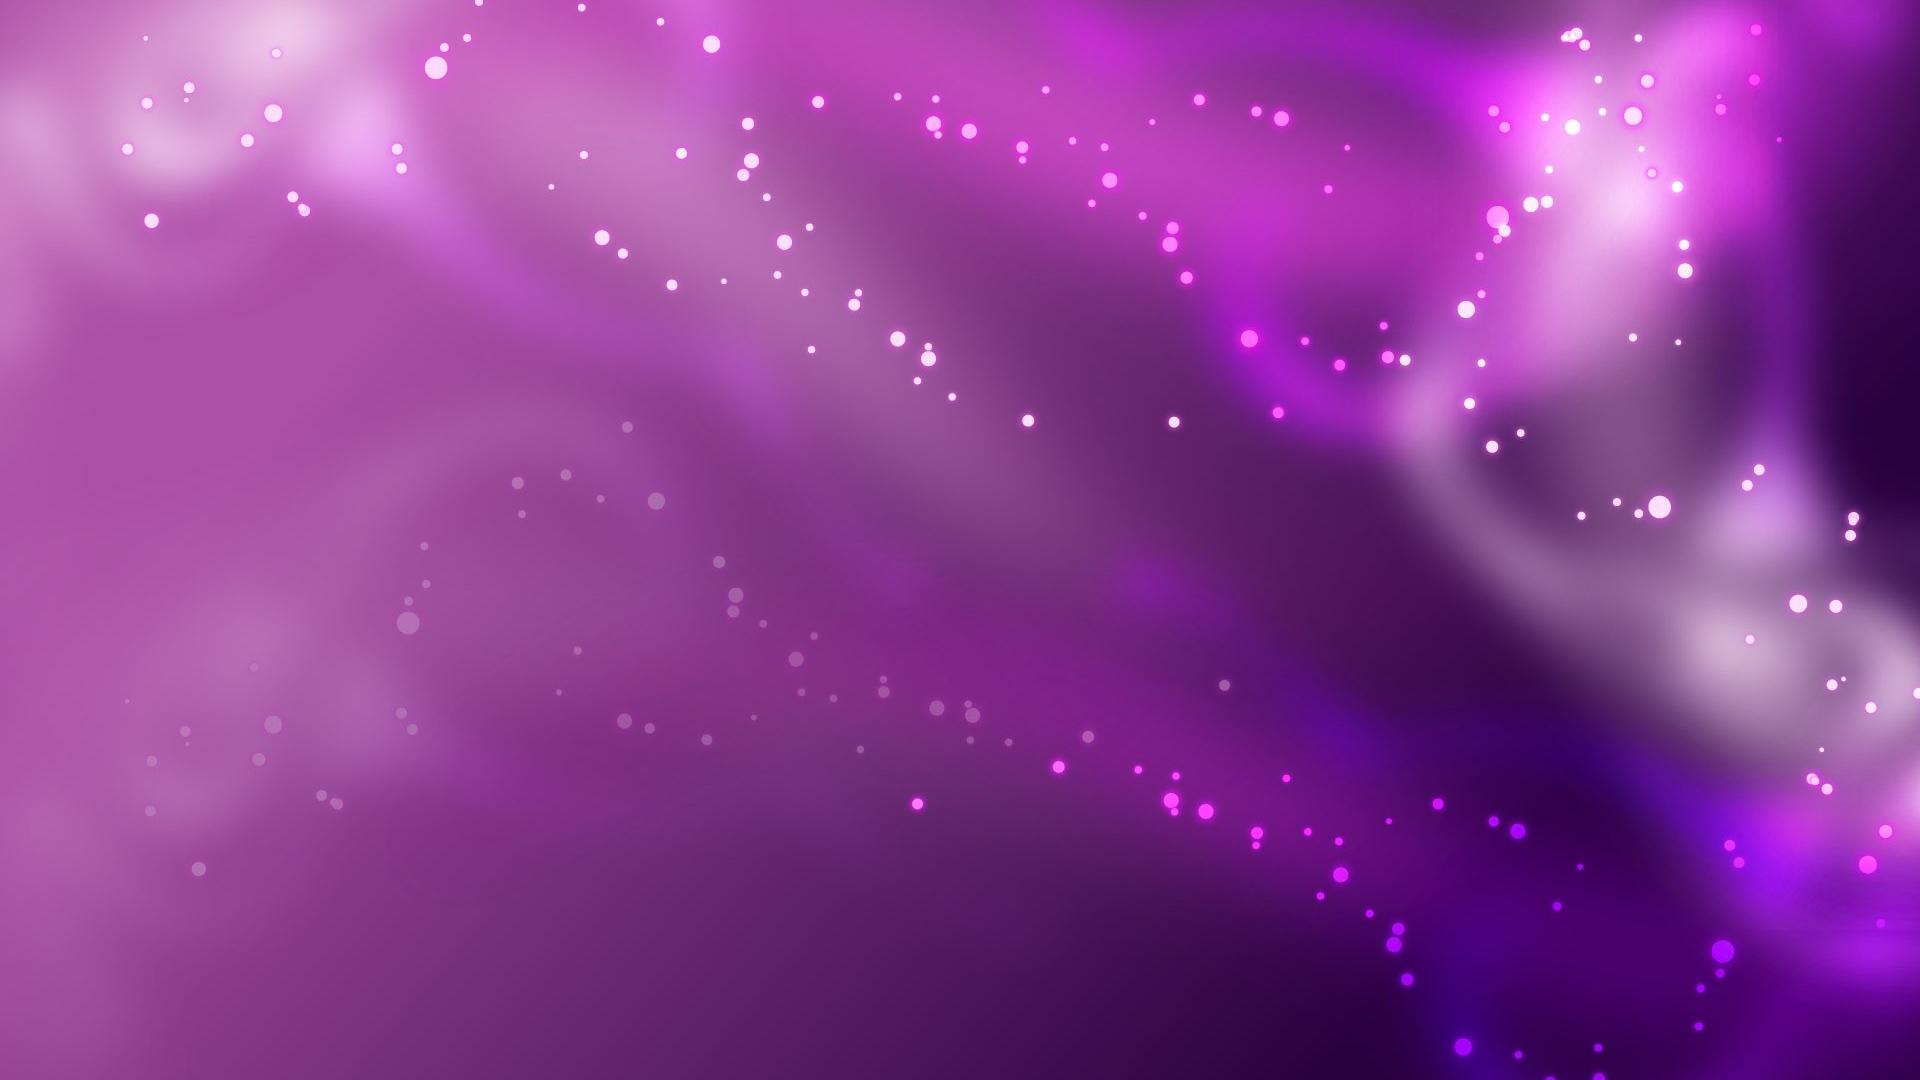 Download Wallpaper 1920x1080 Background Spots Bumps Shine Full Hd 1080p Hd Background